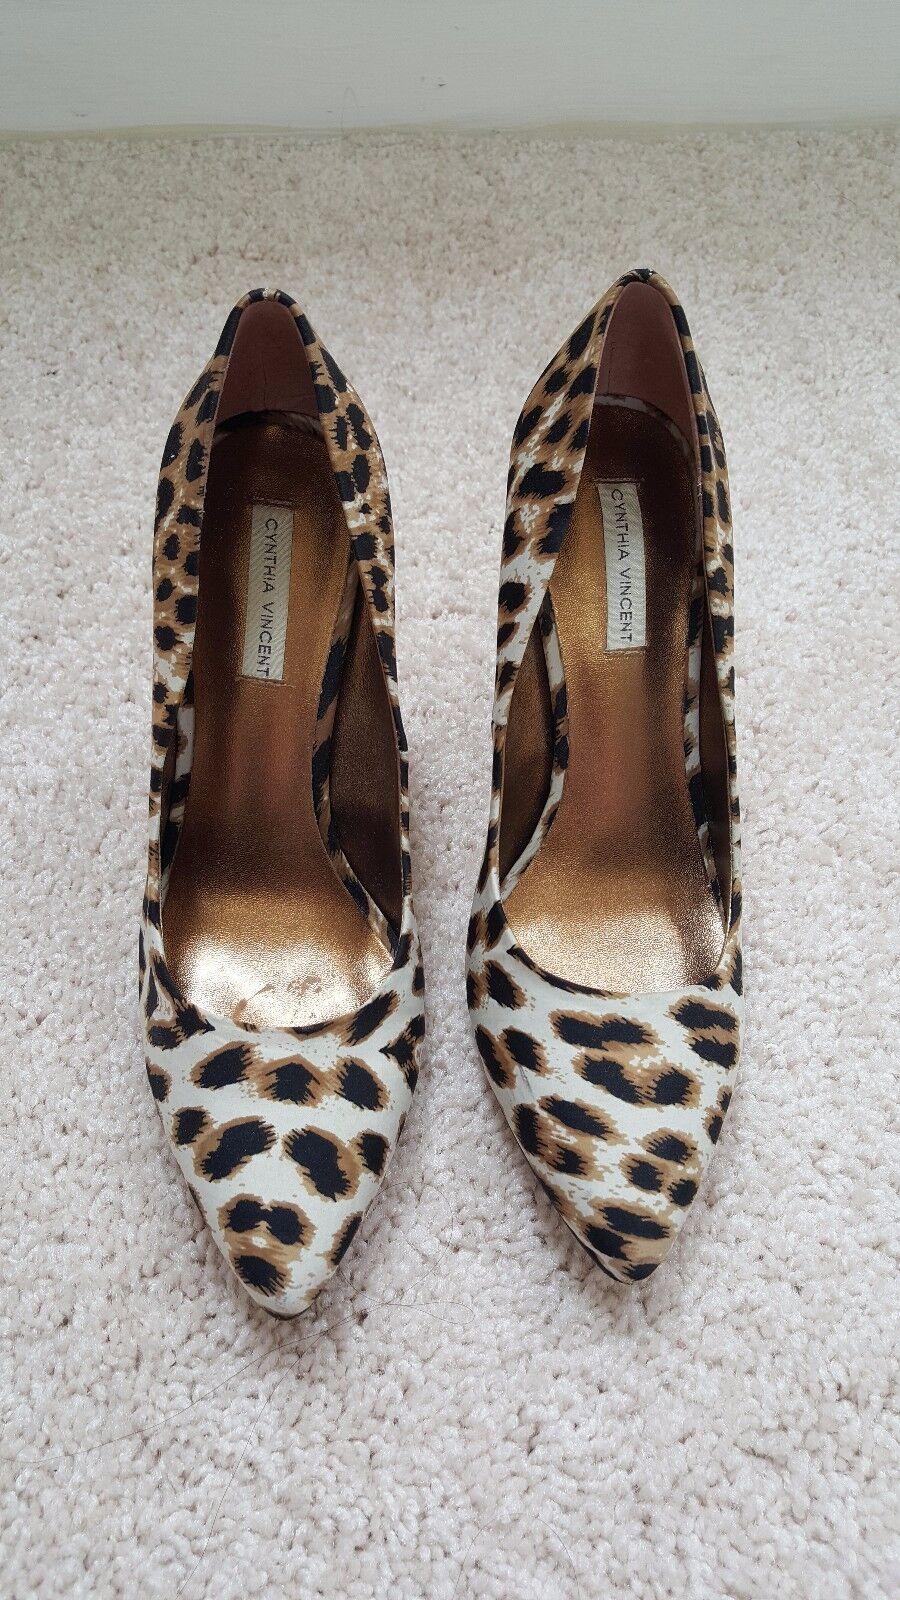 Cynthia Vincent Vincent Vincent Leopard Print High Heel Chunky Pumps Ivory Brown Multi,  Size 7 70b5f1